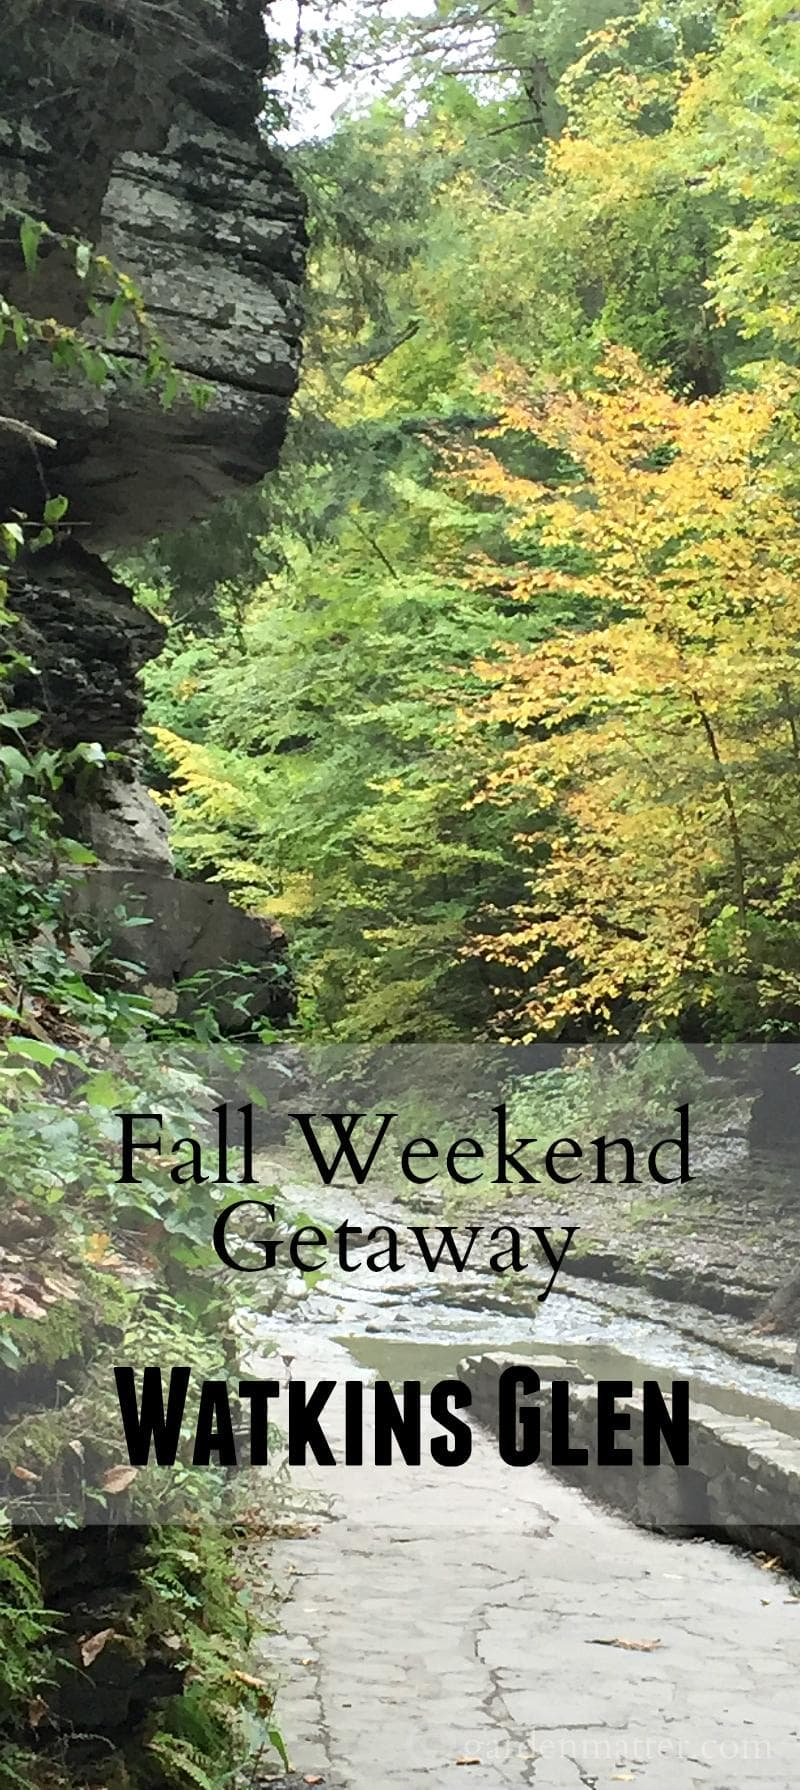 A visit to Watkins Glen, NY for a fabulous fall weekend getaway.